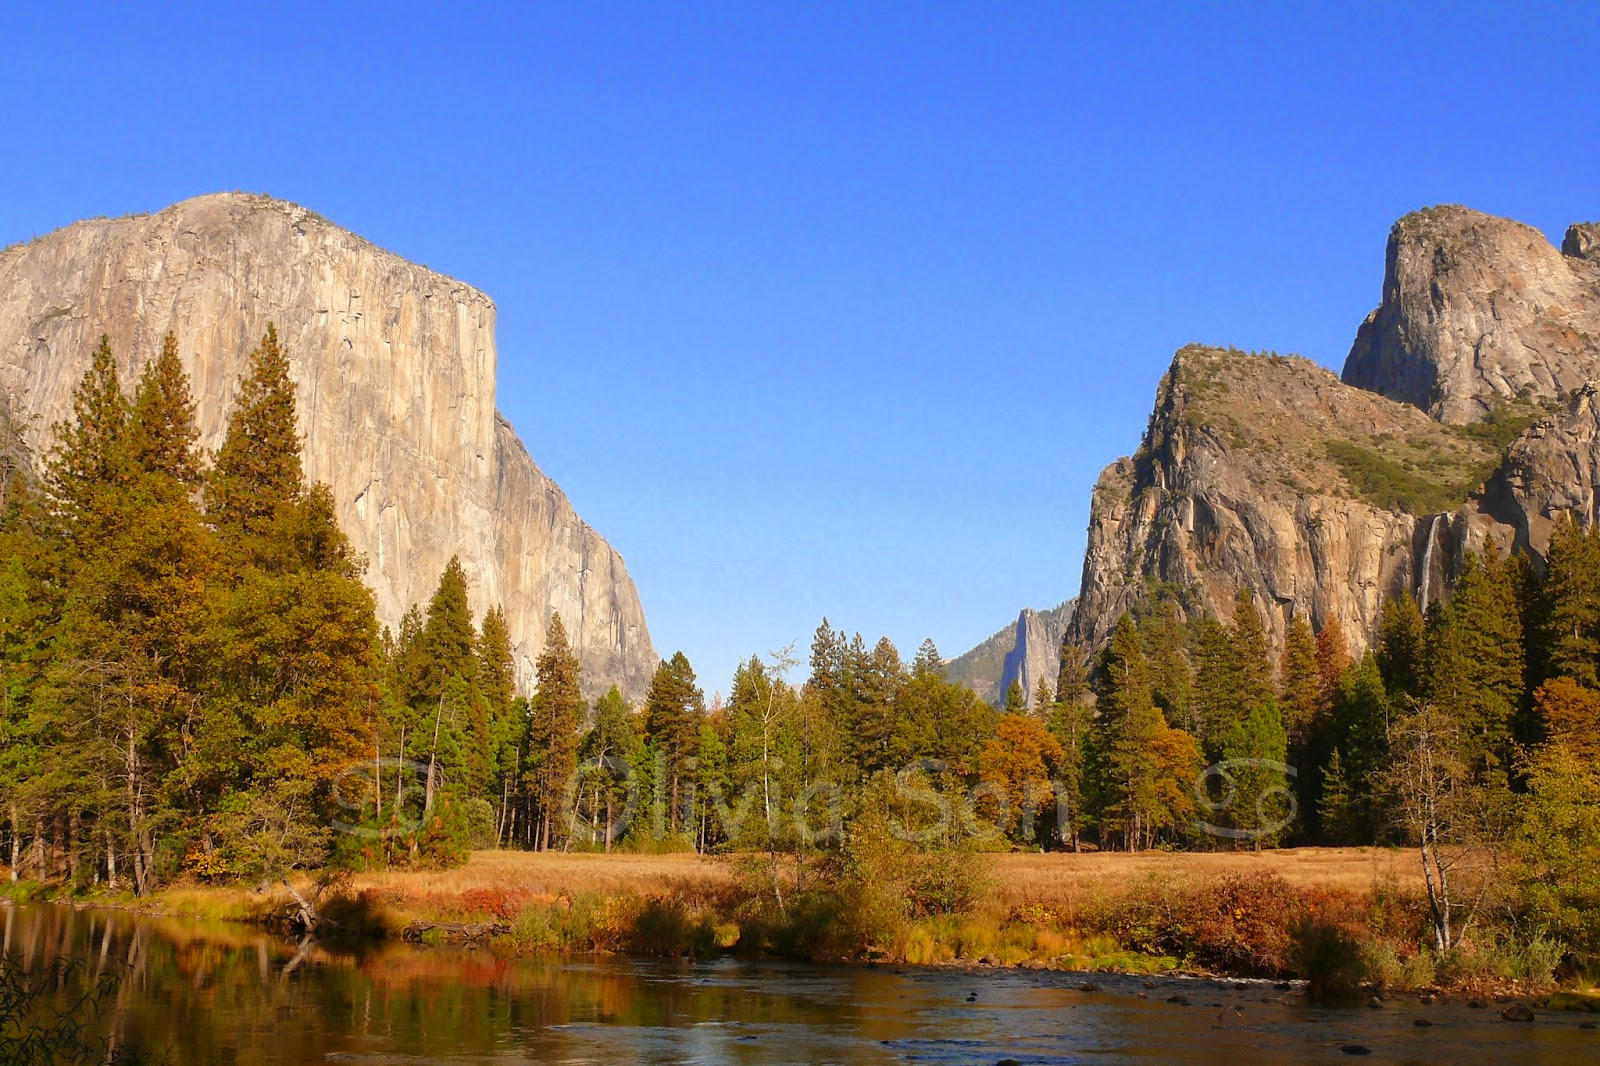 U-shaped valley, Yosemite National Park, California, USA